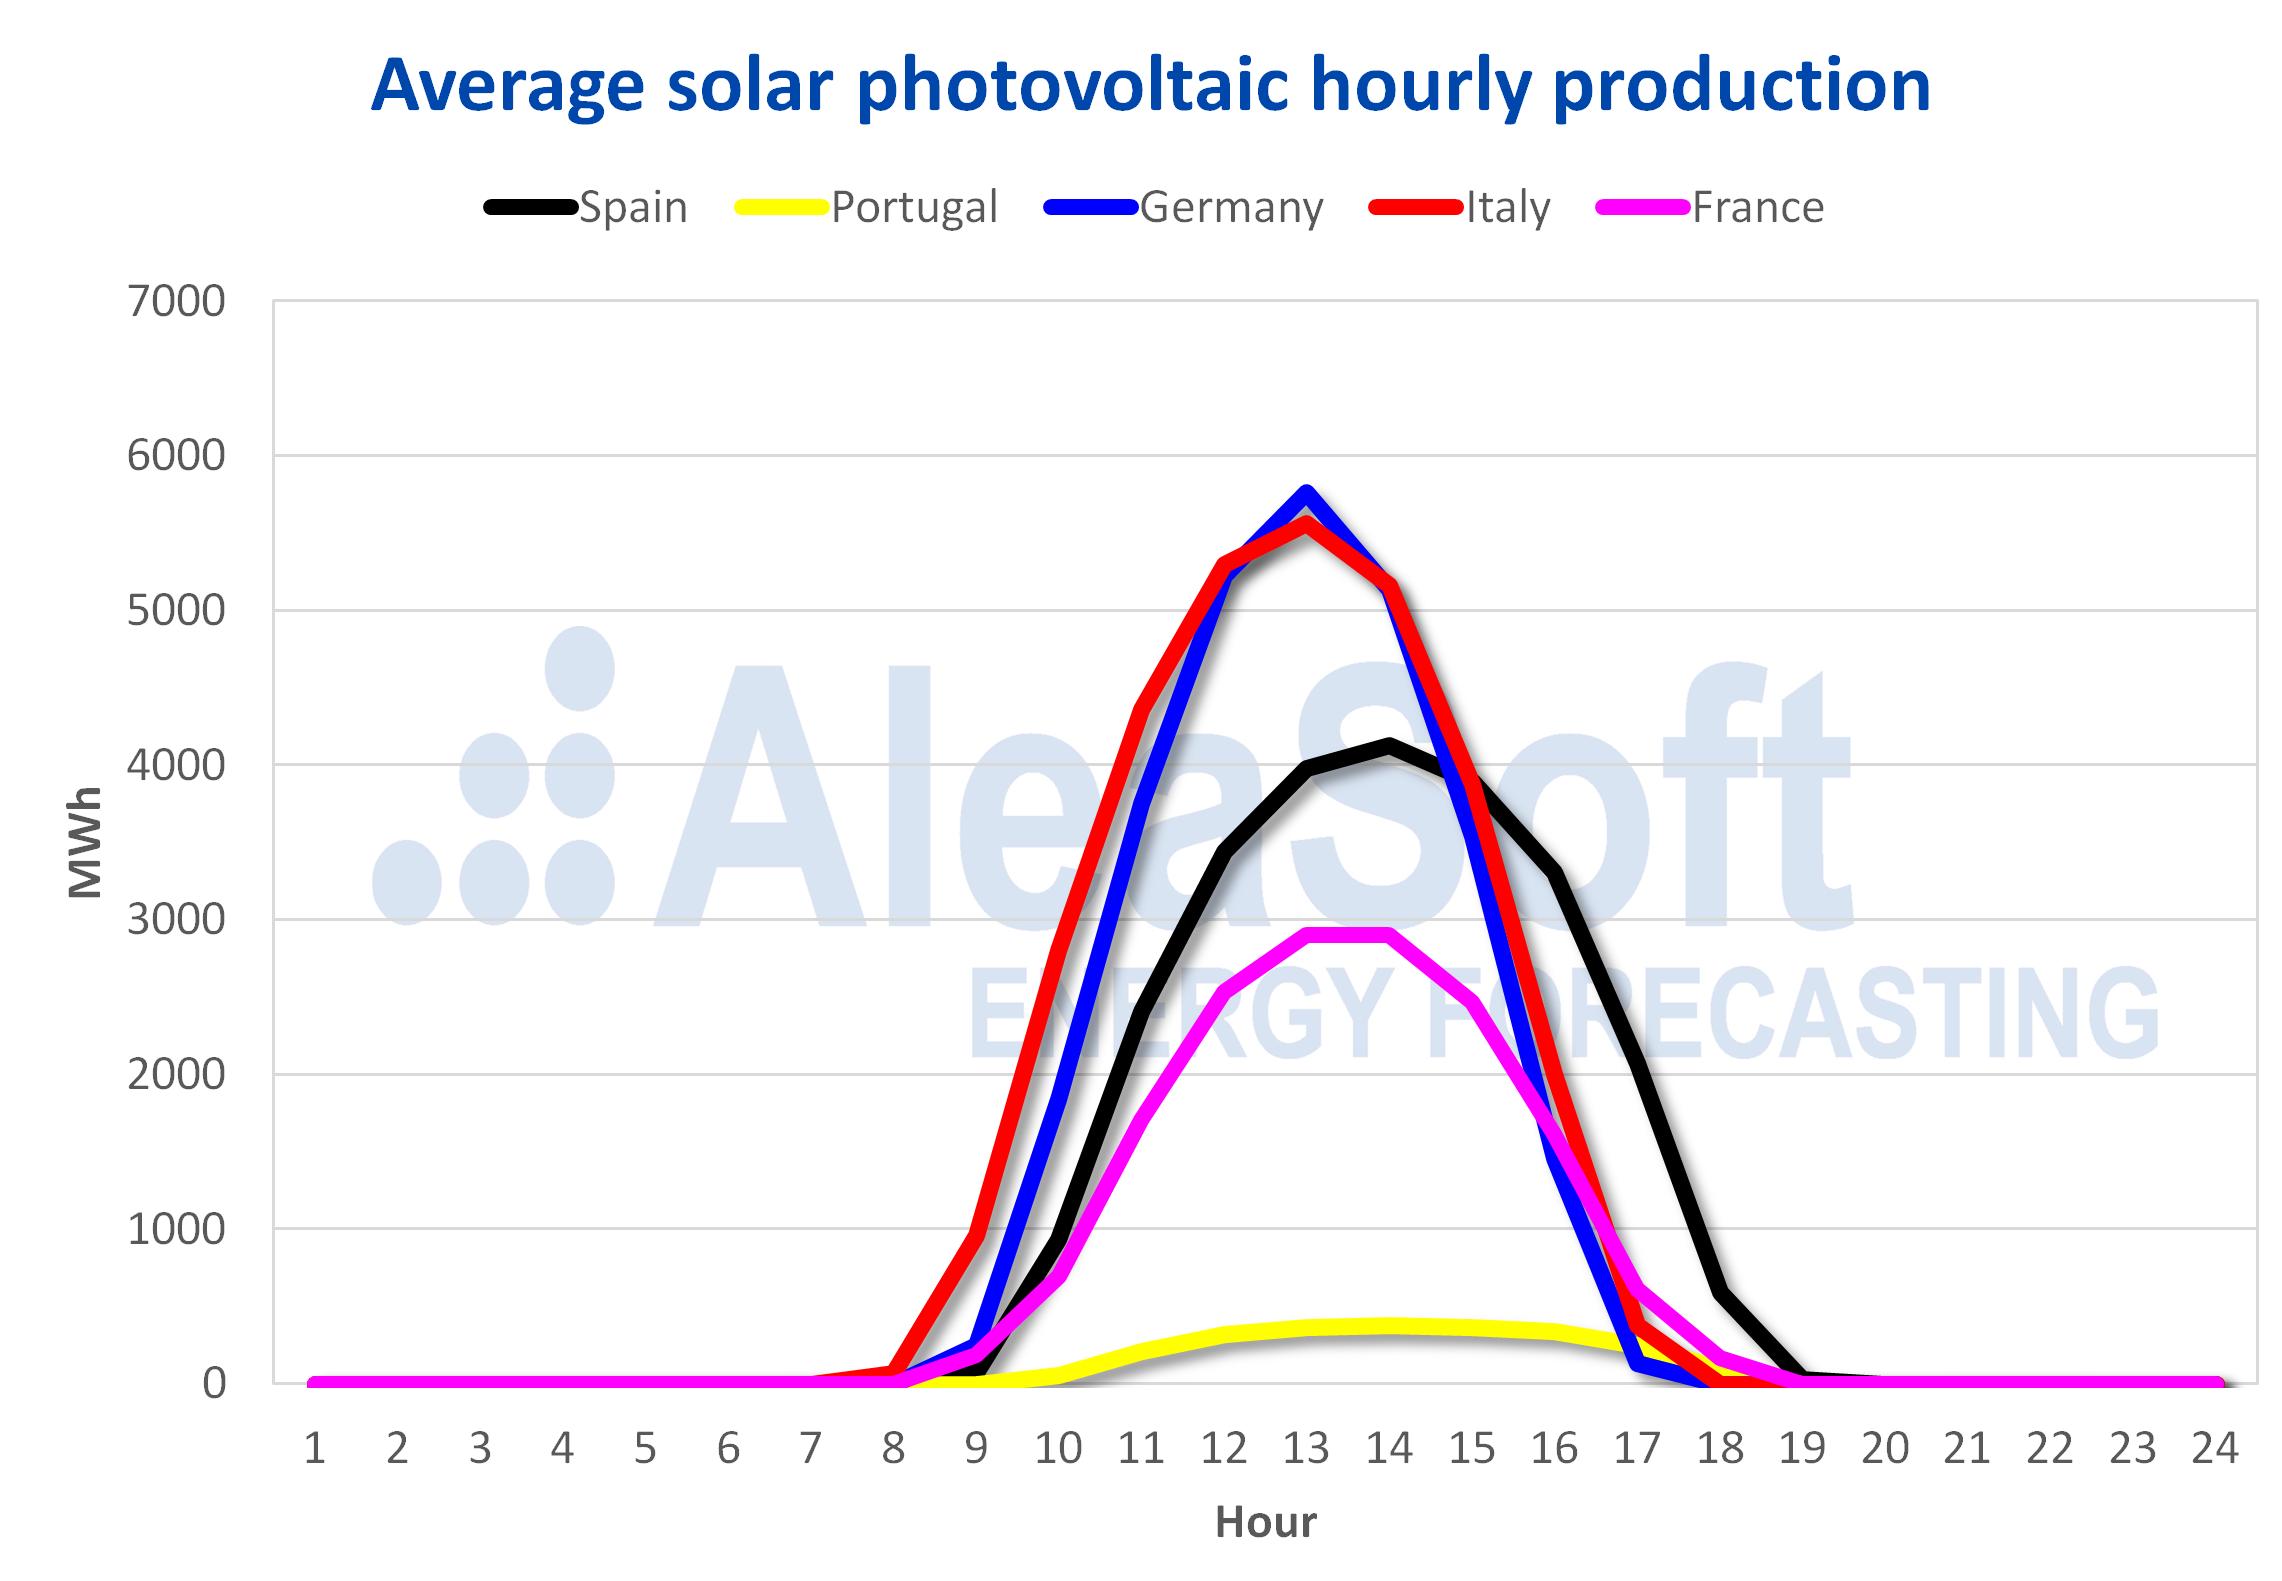 AleaSoft - Solar photovoltaic production profile Europe